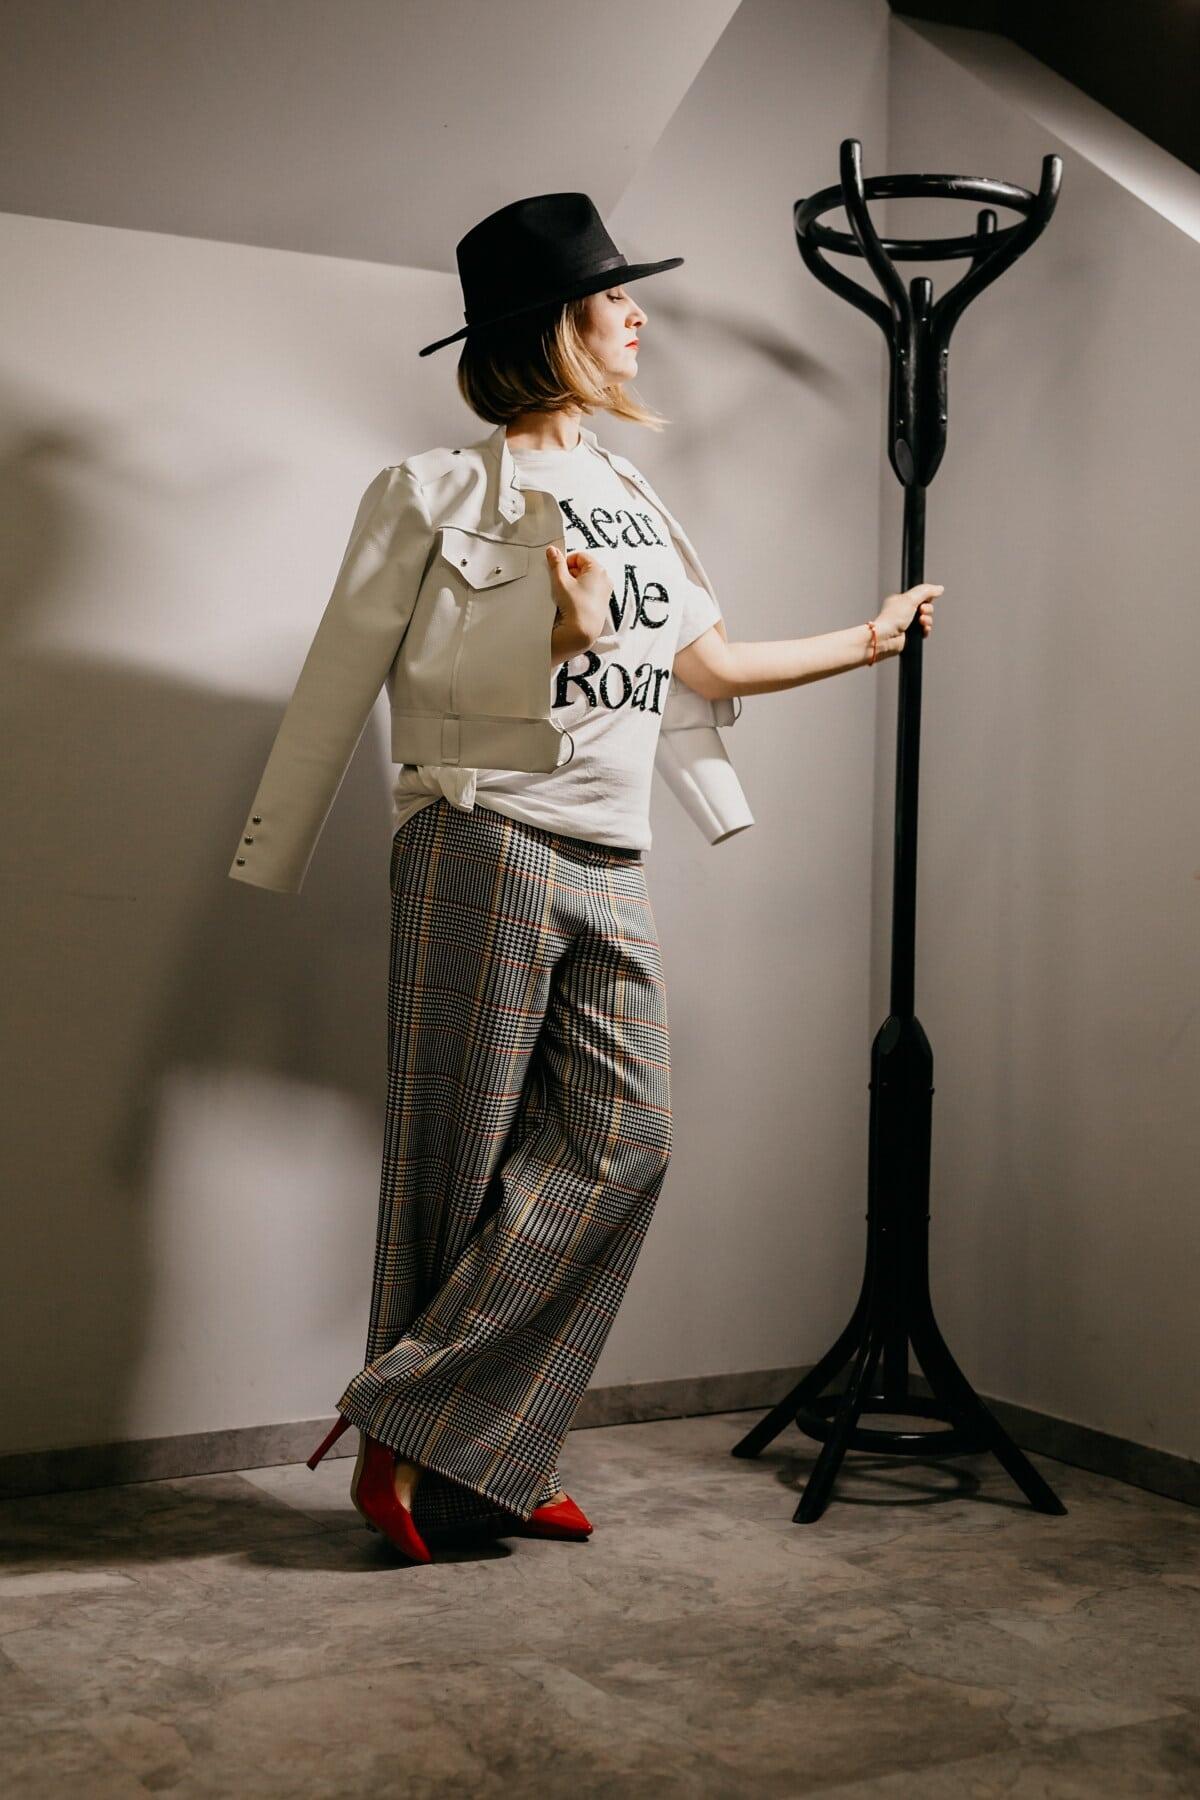 hat, black, fashion, trendy, woman, fancy, outfit, posing, standing, pants